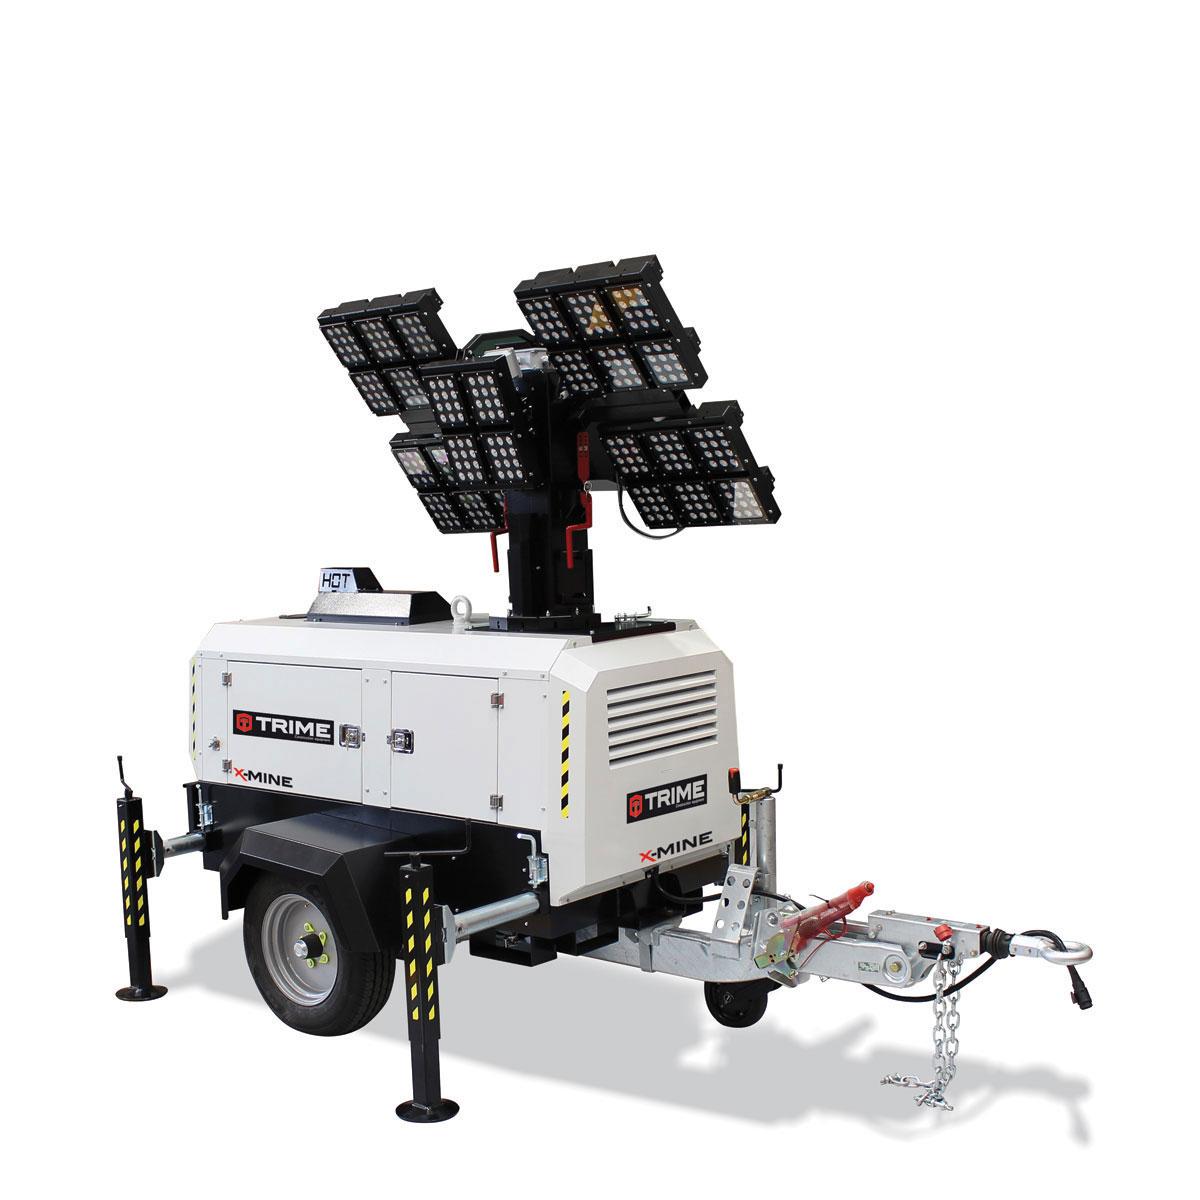 prozektoru-masts-LED-x-mine-28x150W-48V-salikta-pozicija